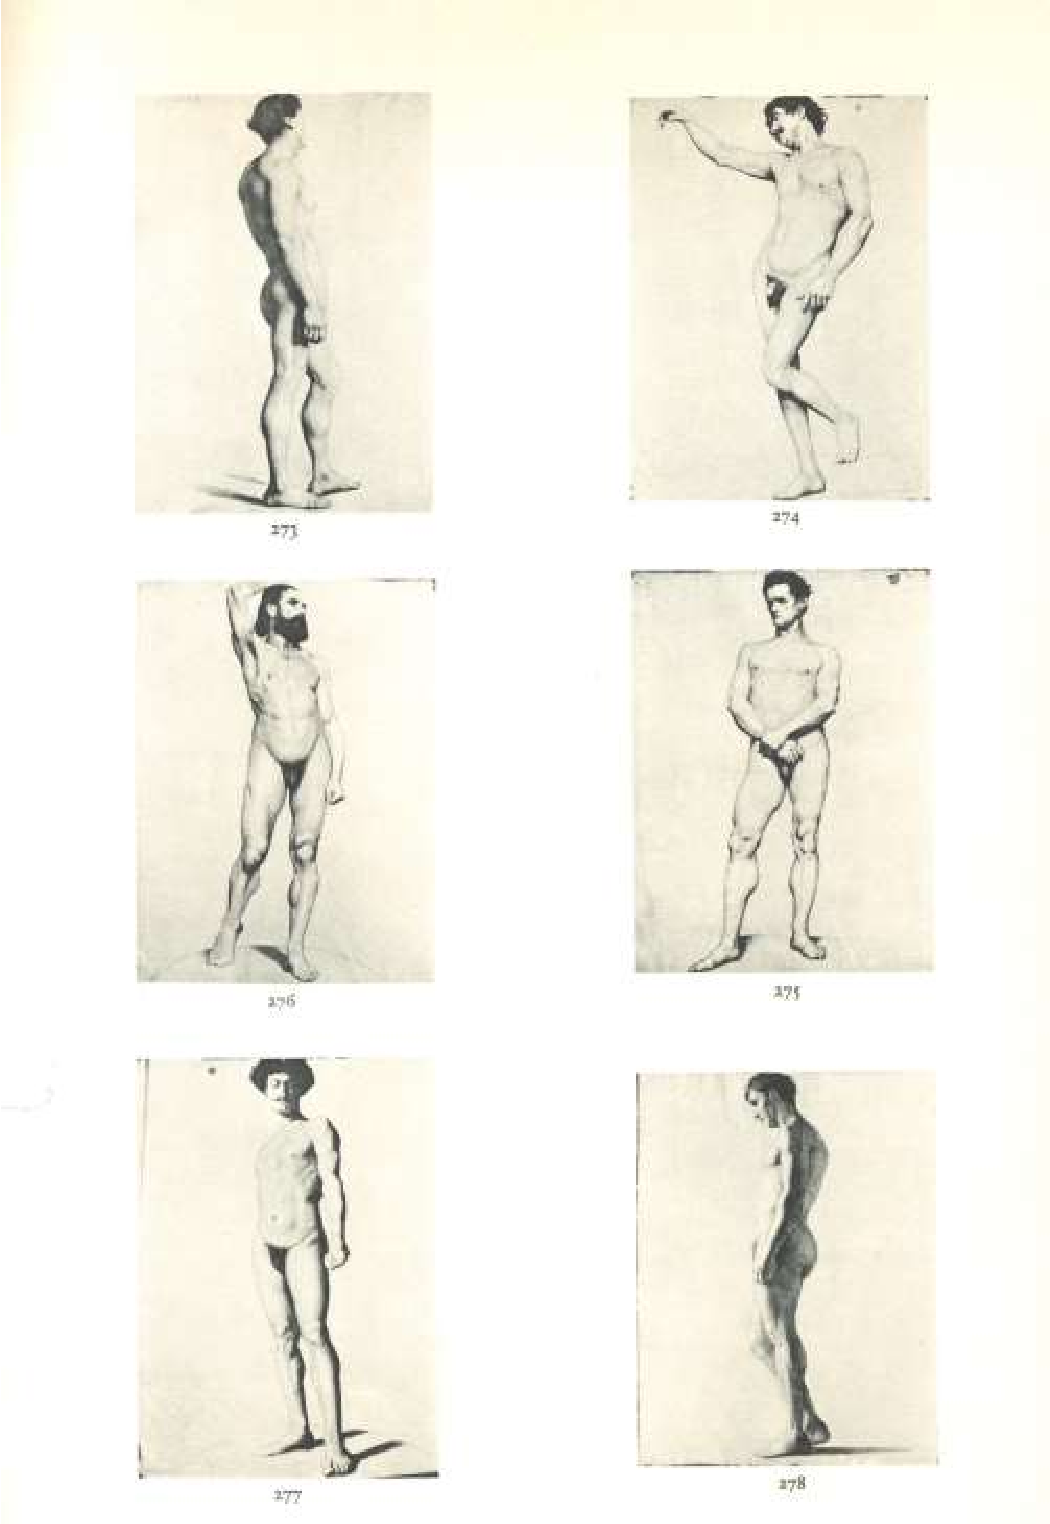 figure 2.53